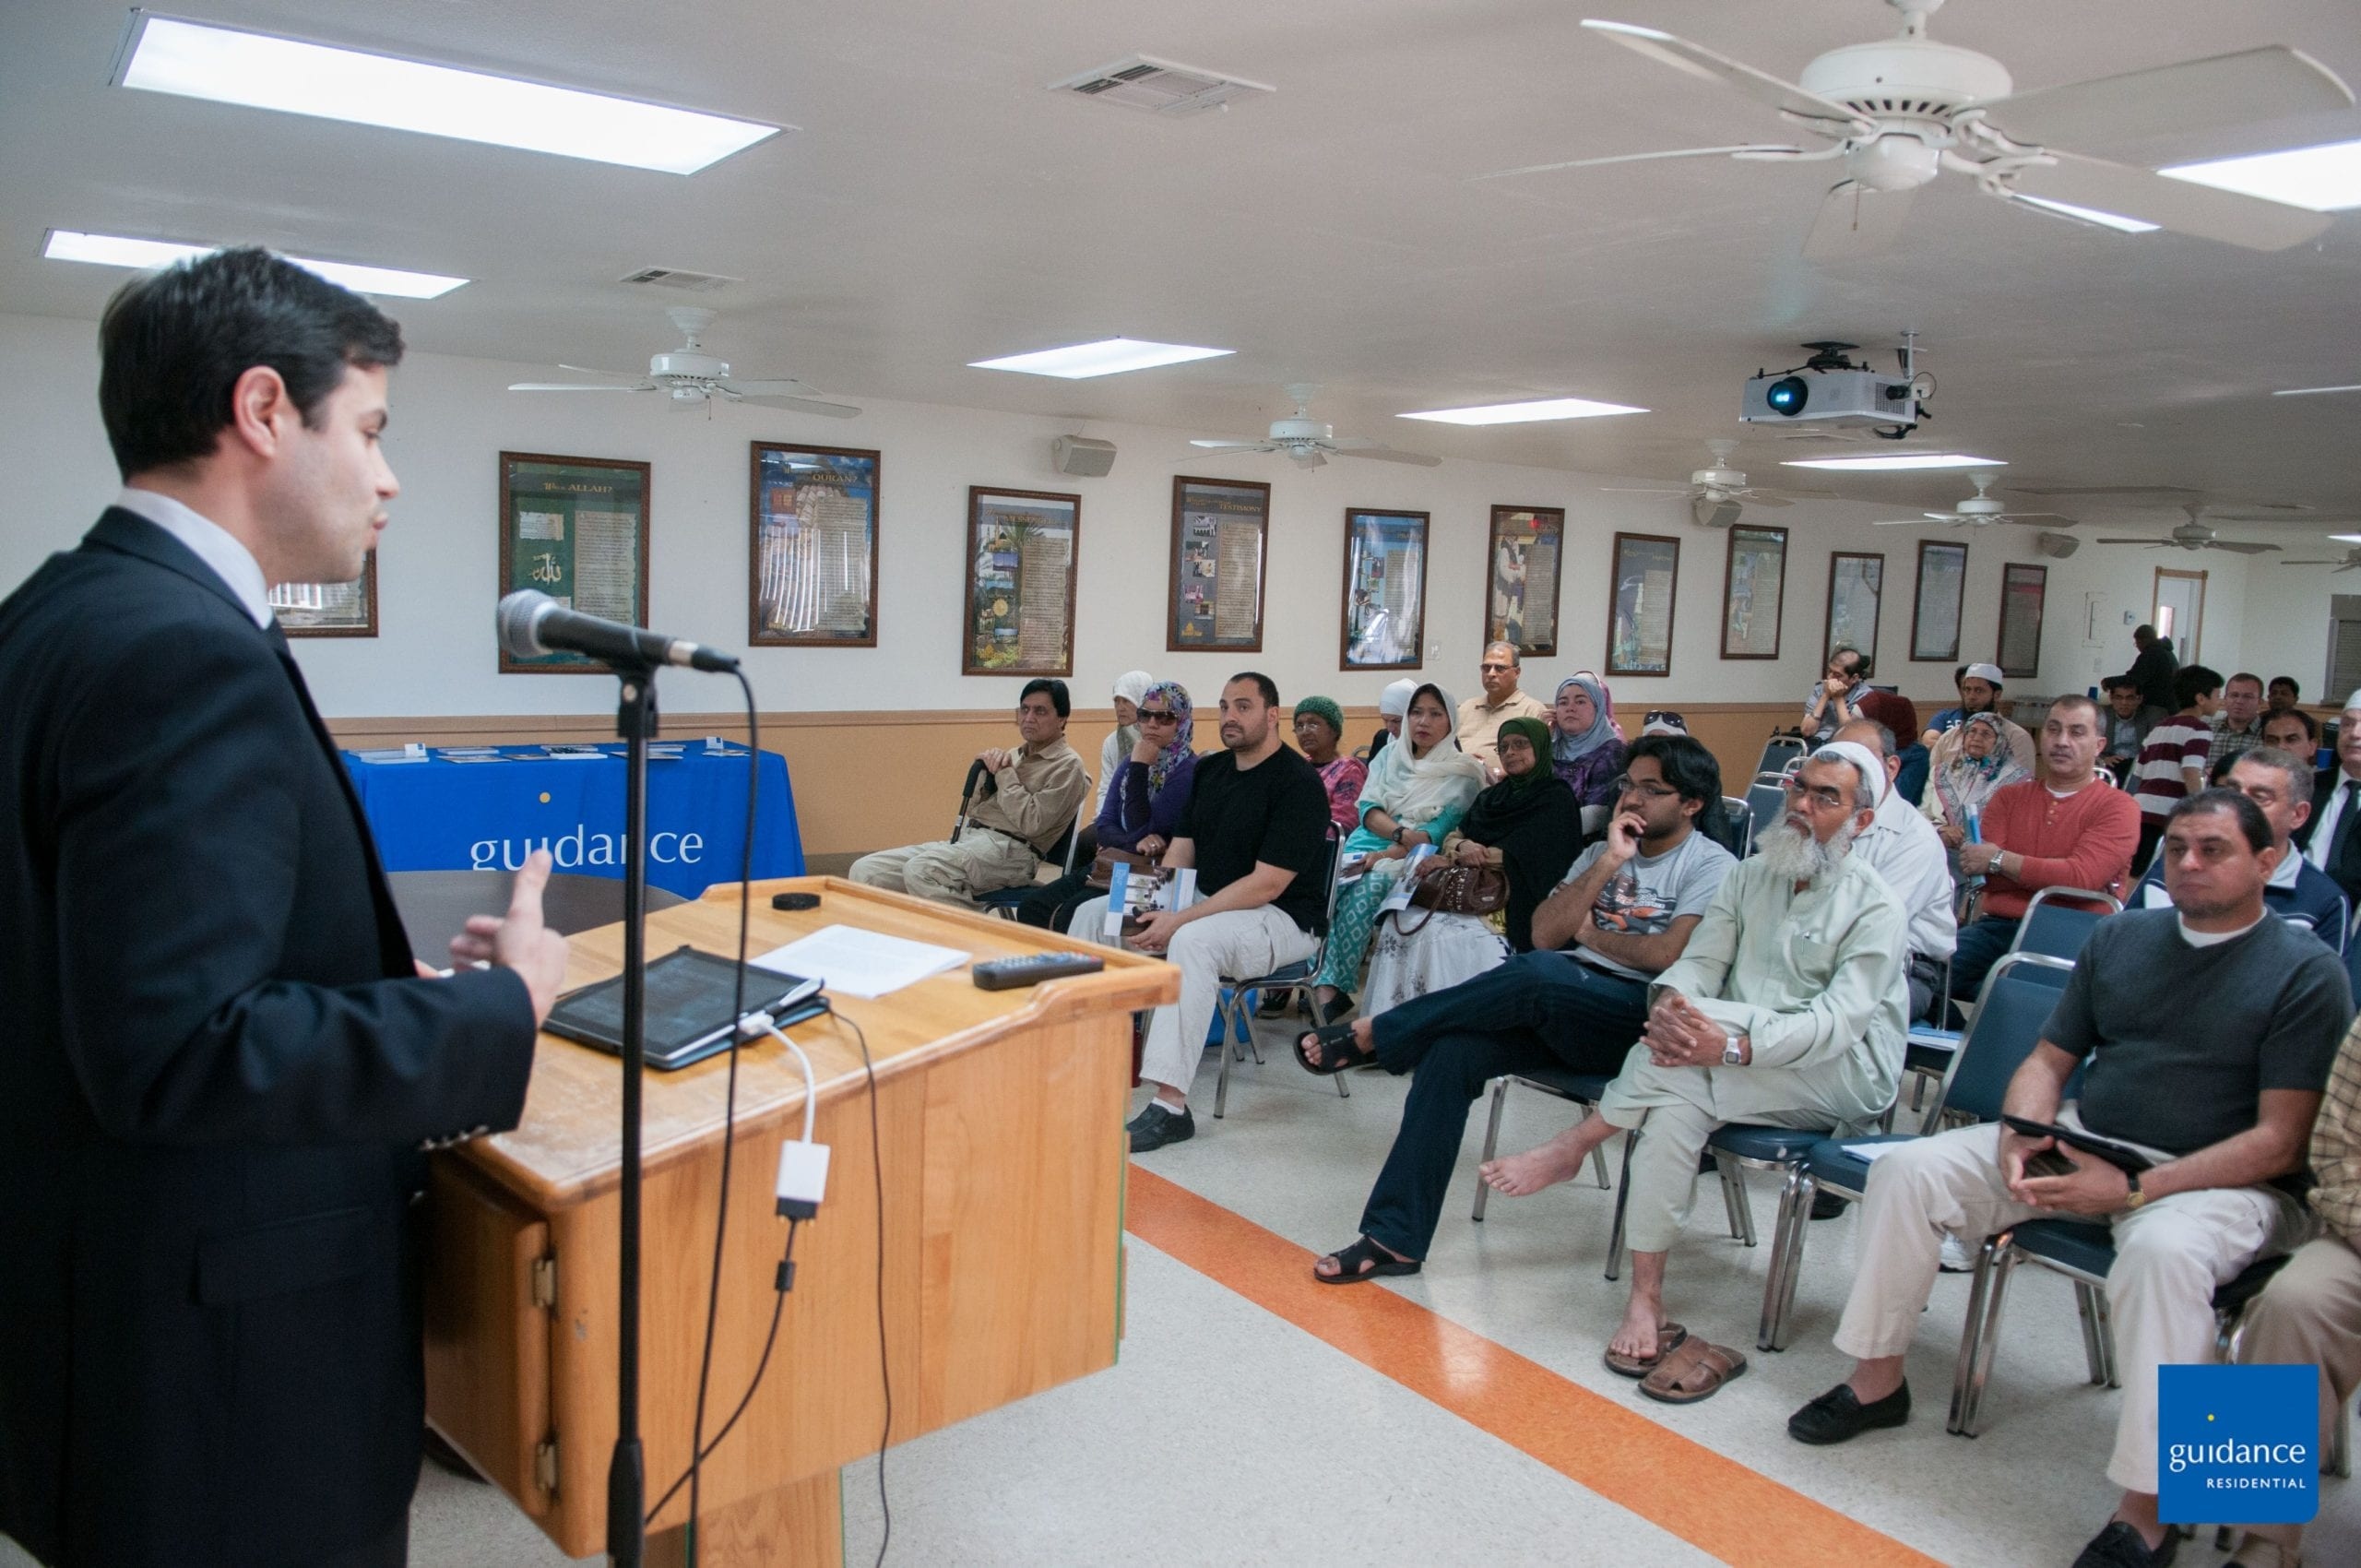 Shaykh Yusuf DeLorenzo - California - Guidance Residential 2